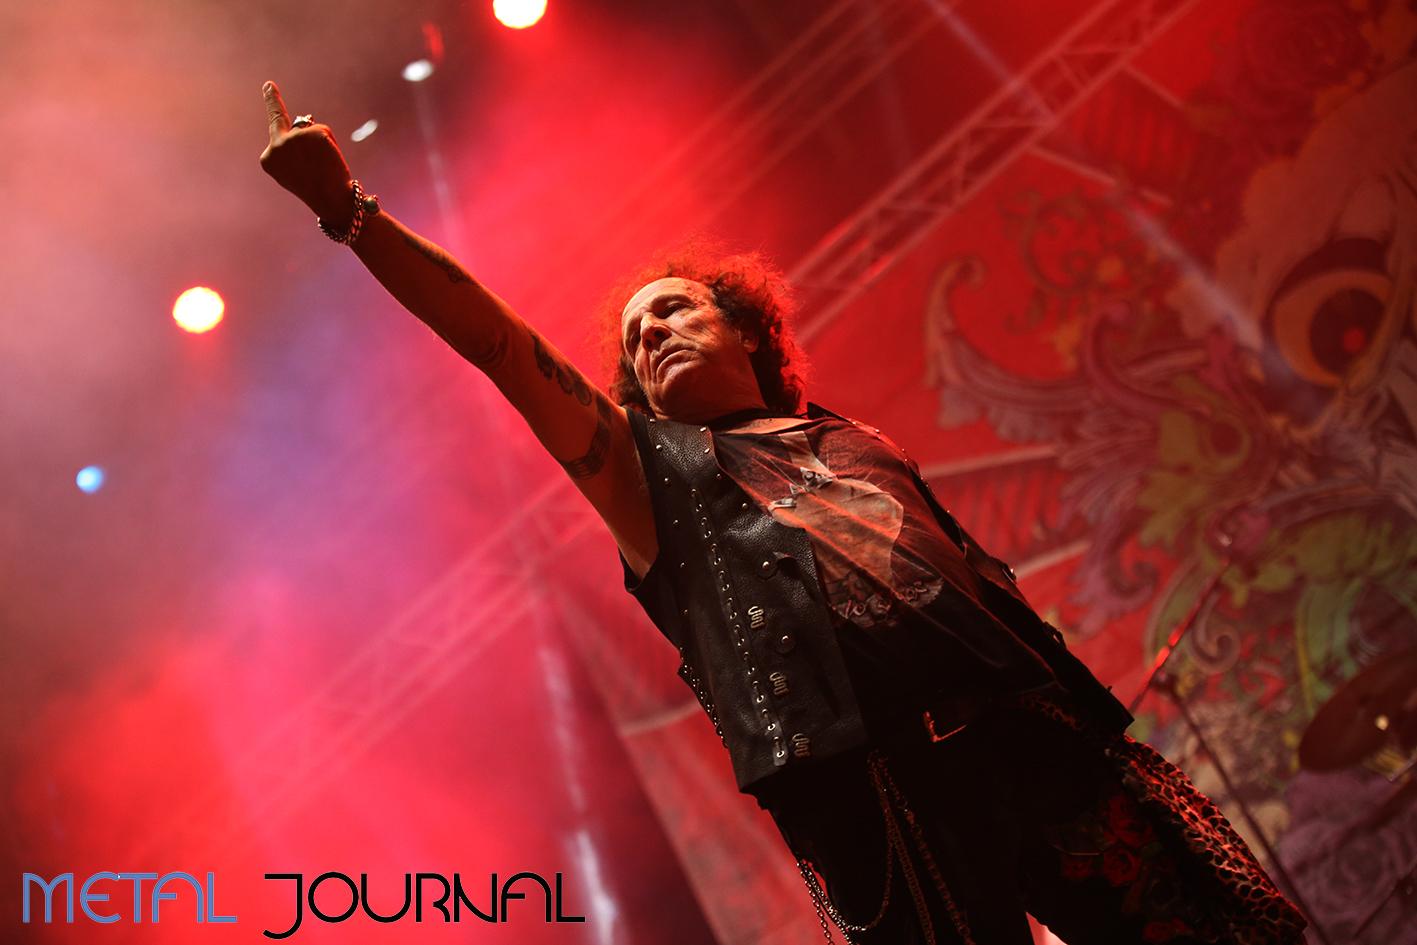 obus - leyendas del rock 2019 metal journal pic 1